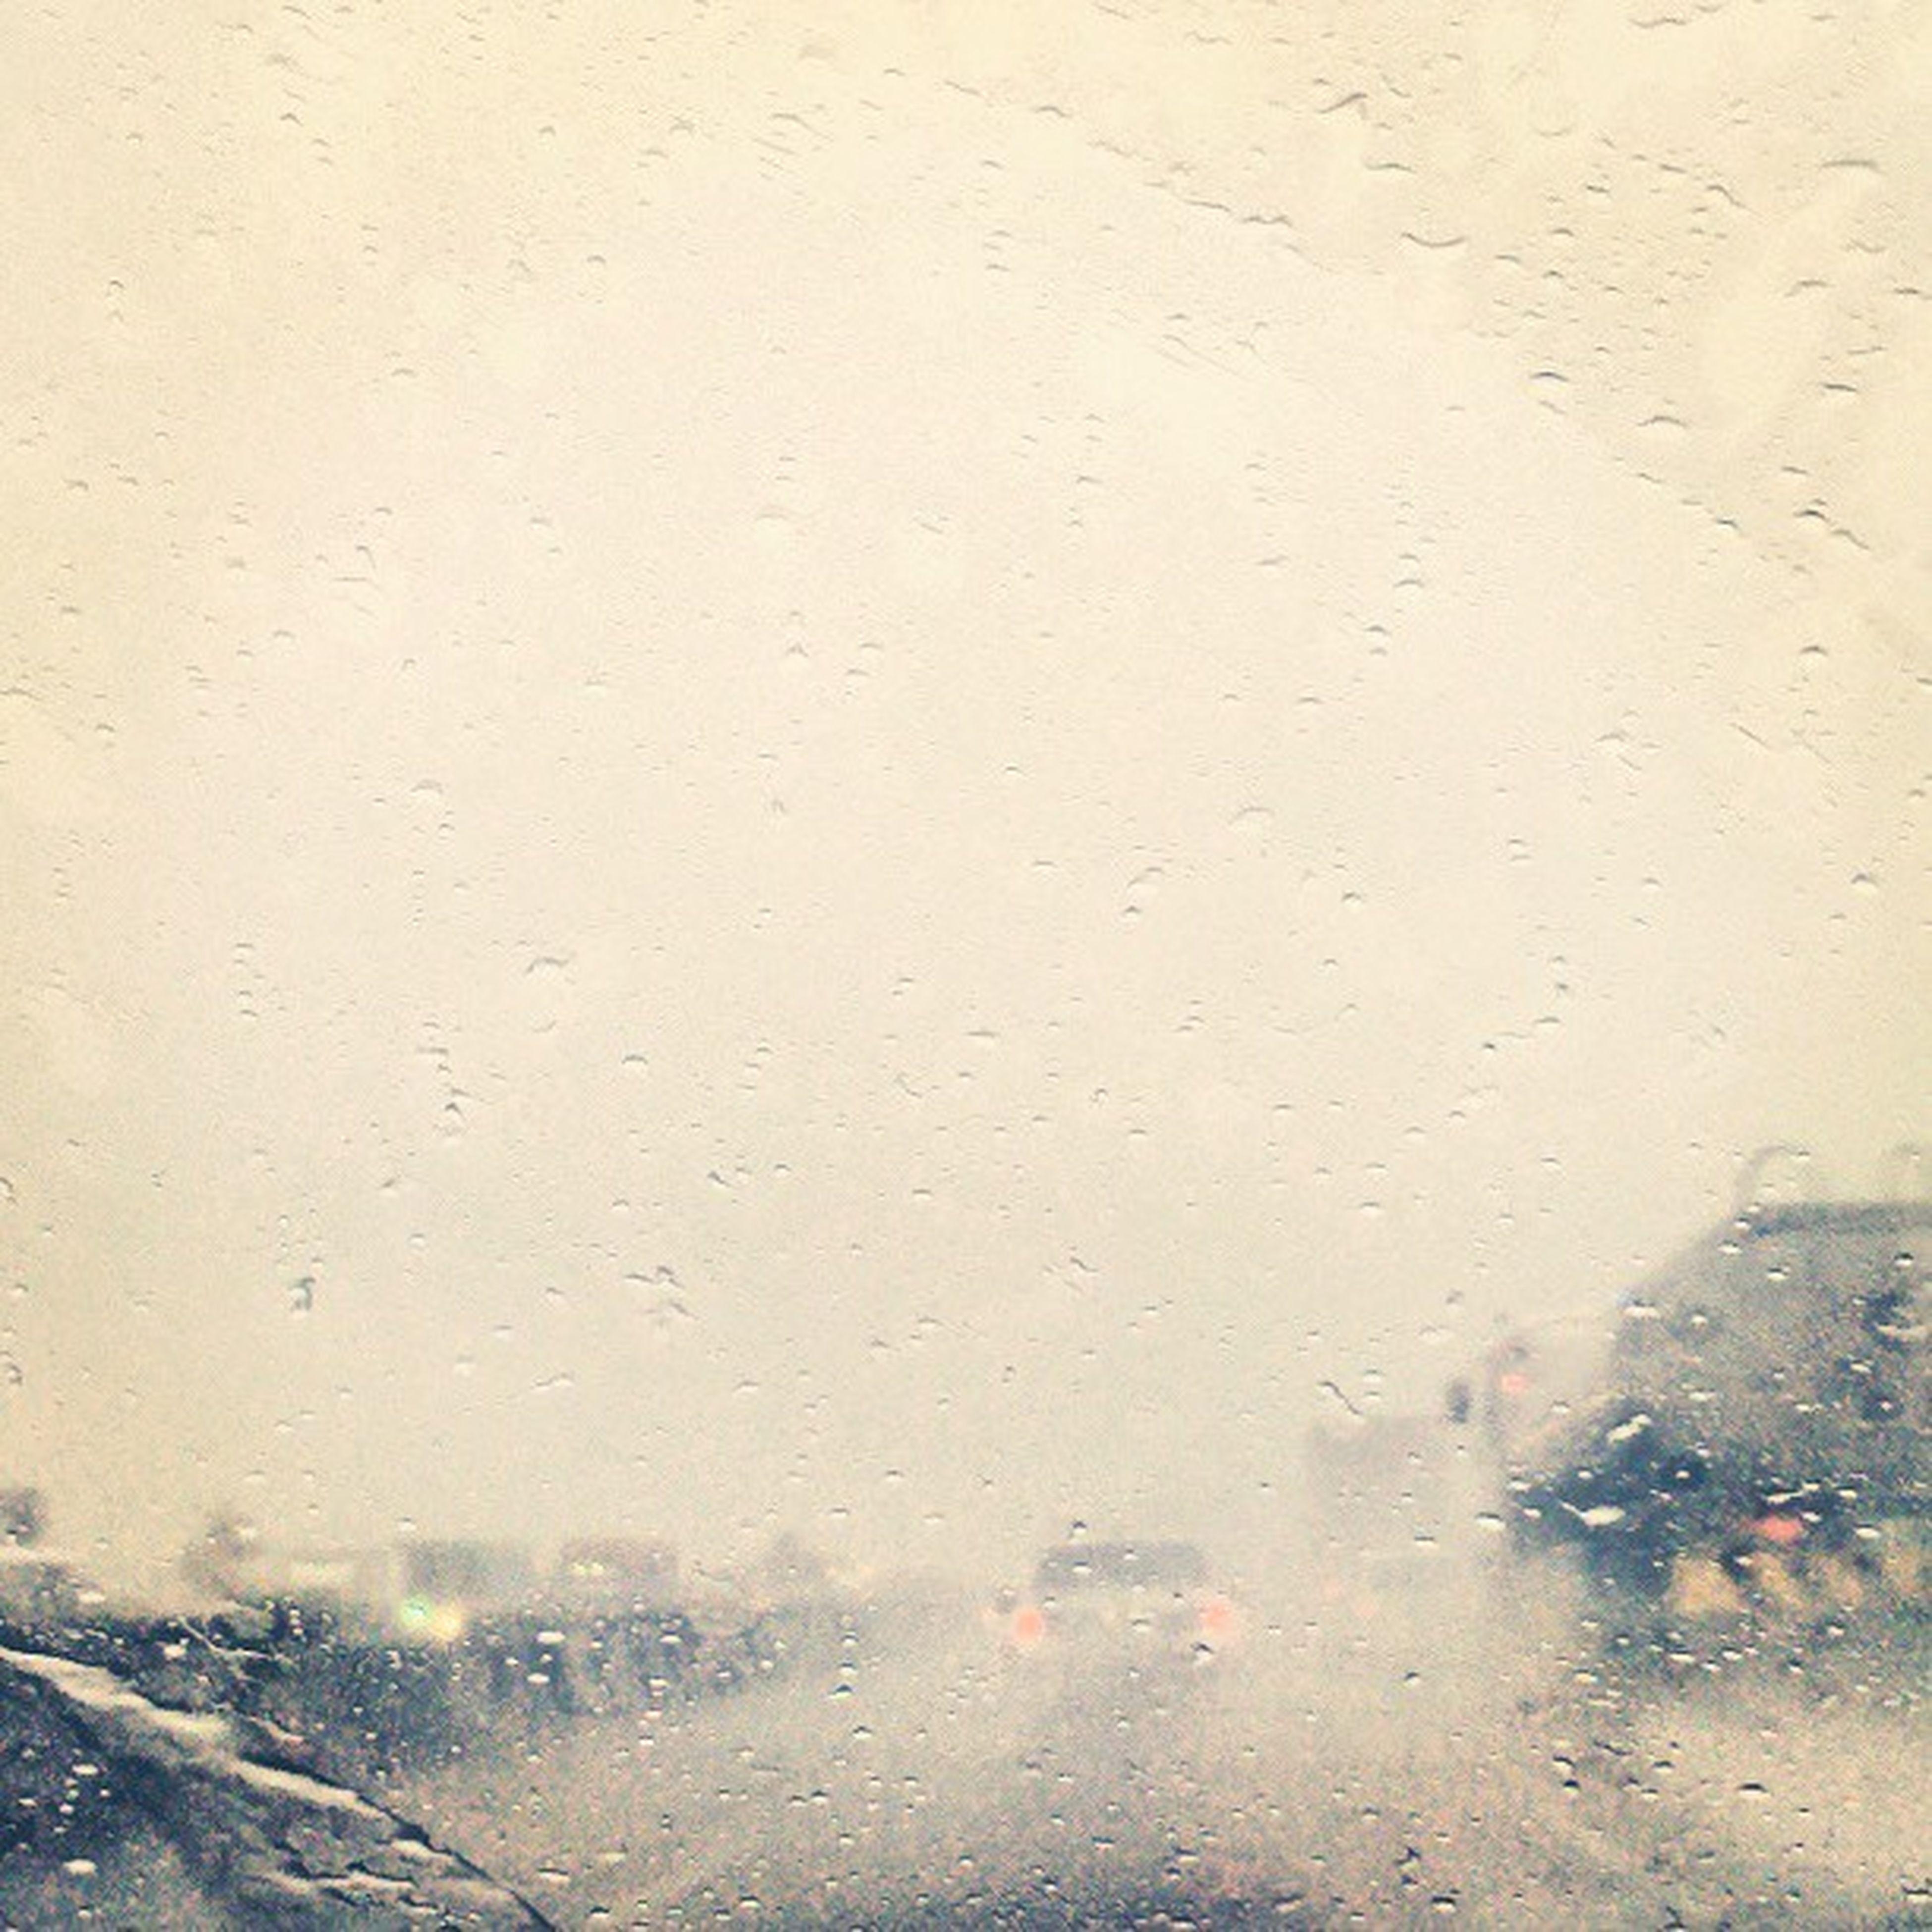 drop, wet, window, rain, transparent, glass - material, water, indoors, weather, raindrop, season, glass, transportation, car, sky, monsoon, full frame, backgrounds, vehicle interior, built structure